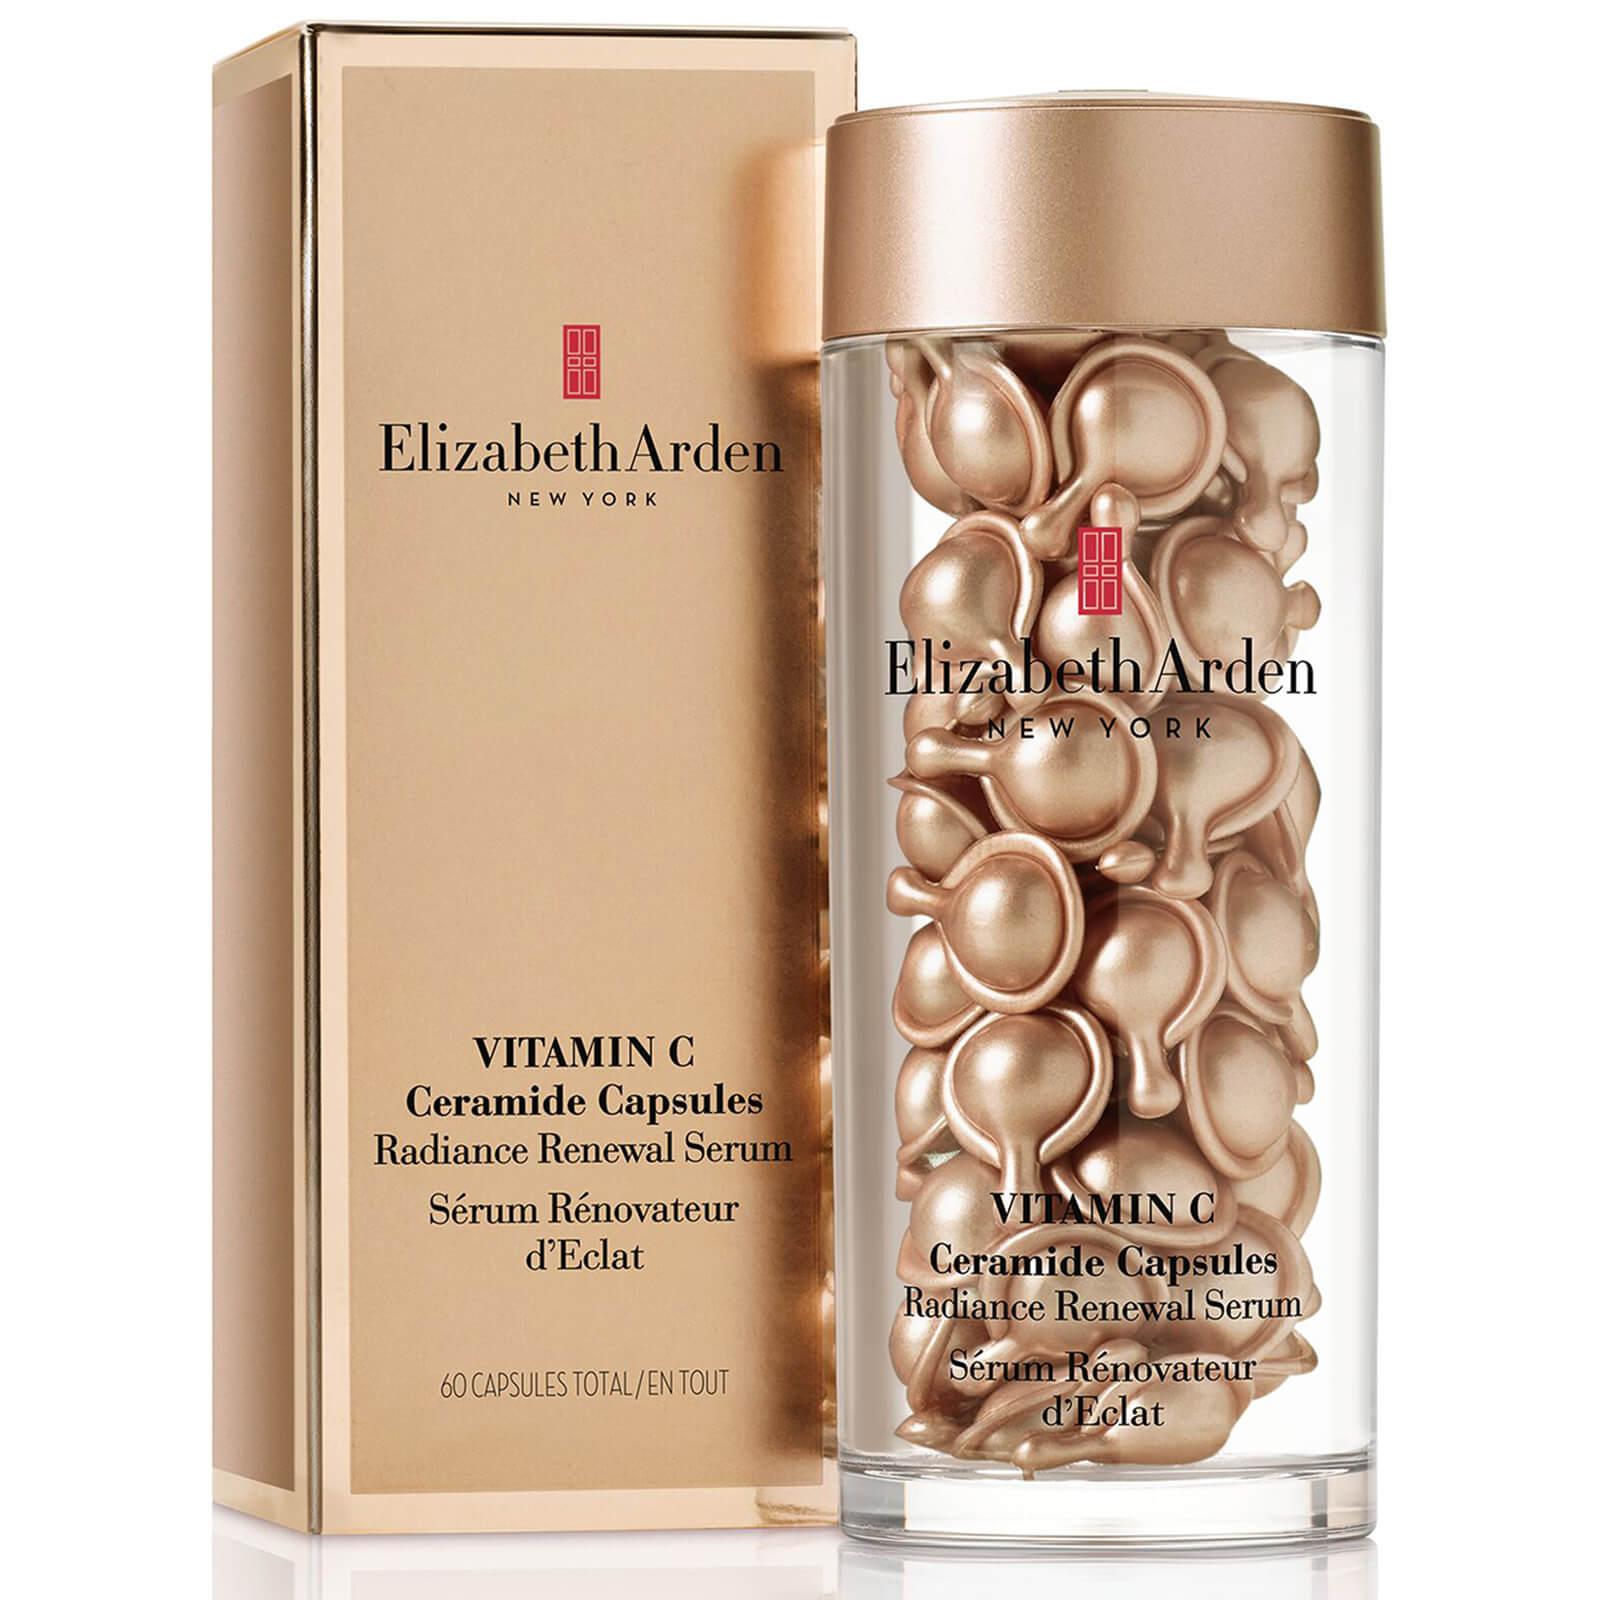 Купить Elizabeth Arden Vitamin C Ceramide Capsules Radiance Renewal Serum 60pc